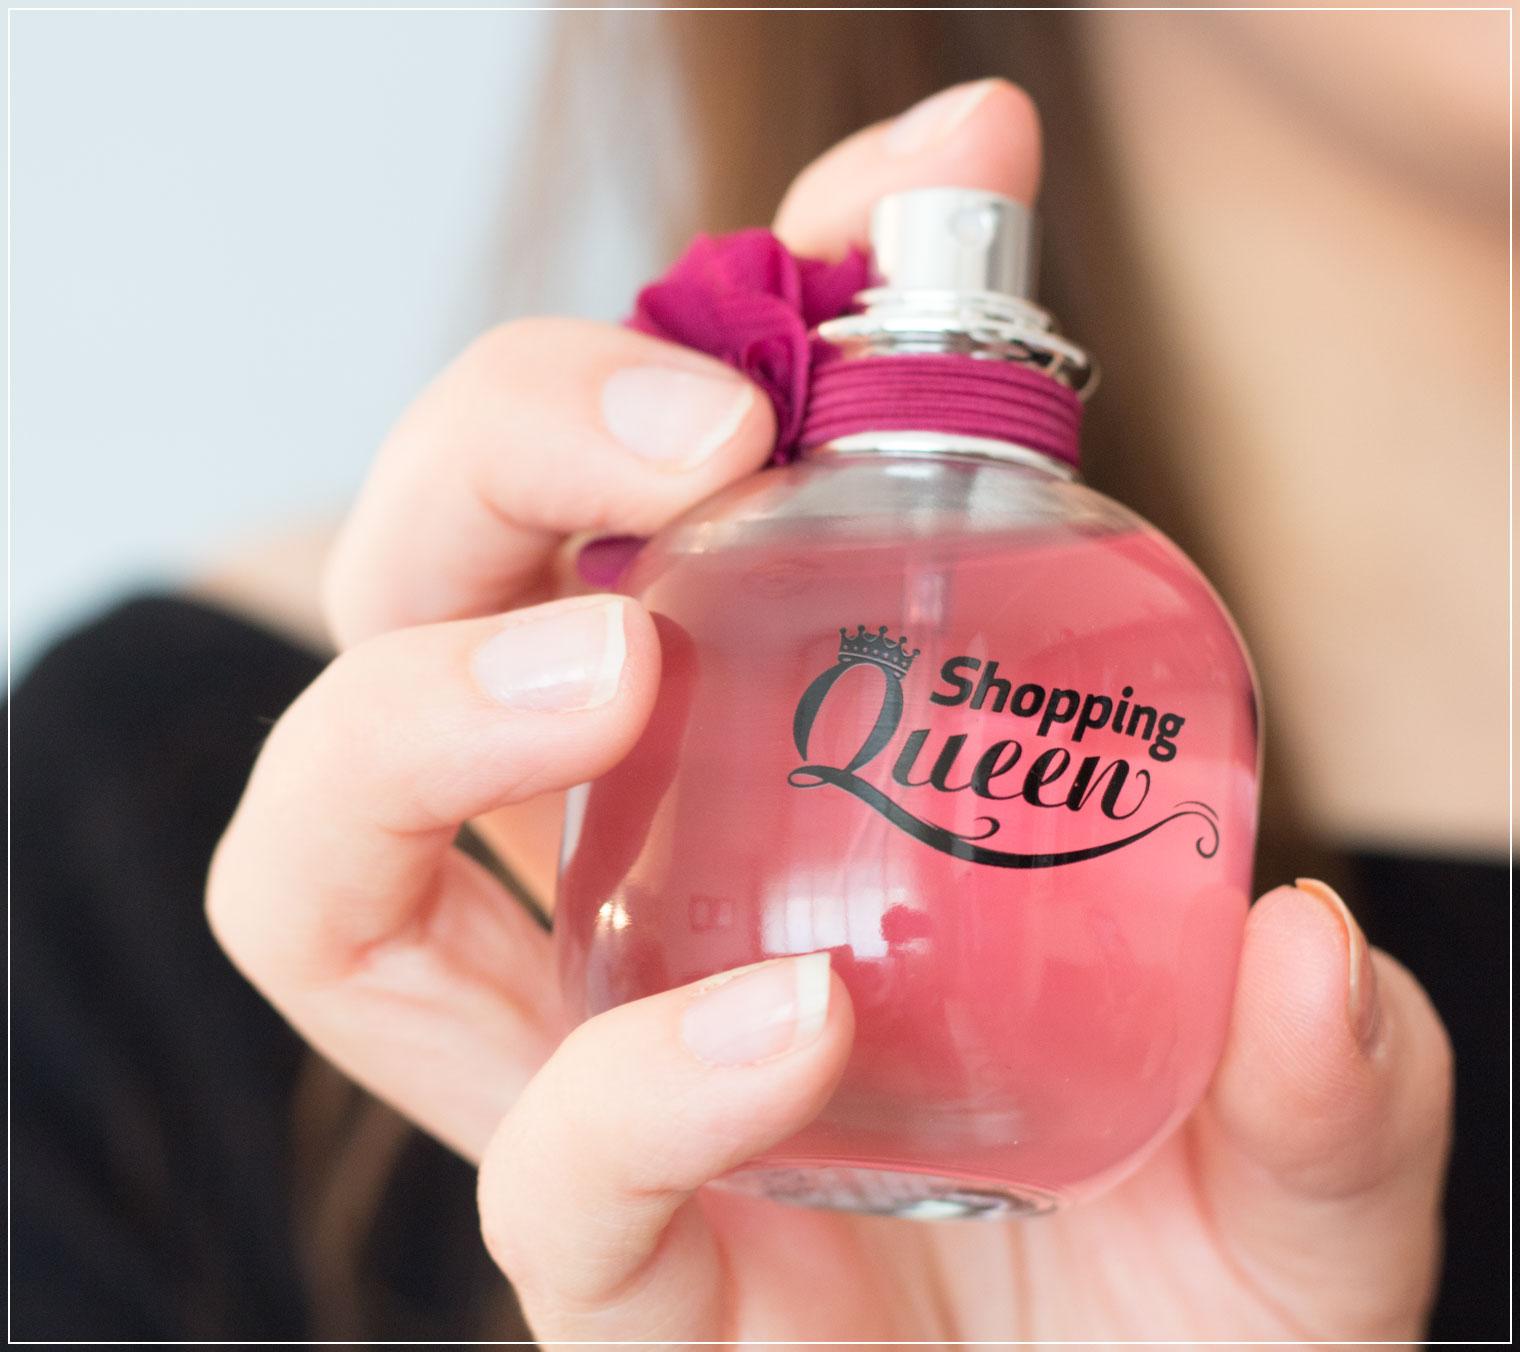 Shopping Queen, Parfum, Midnight Queen, Merchandise